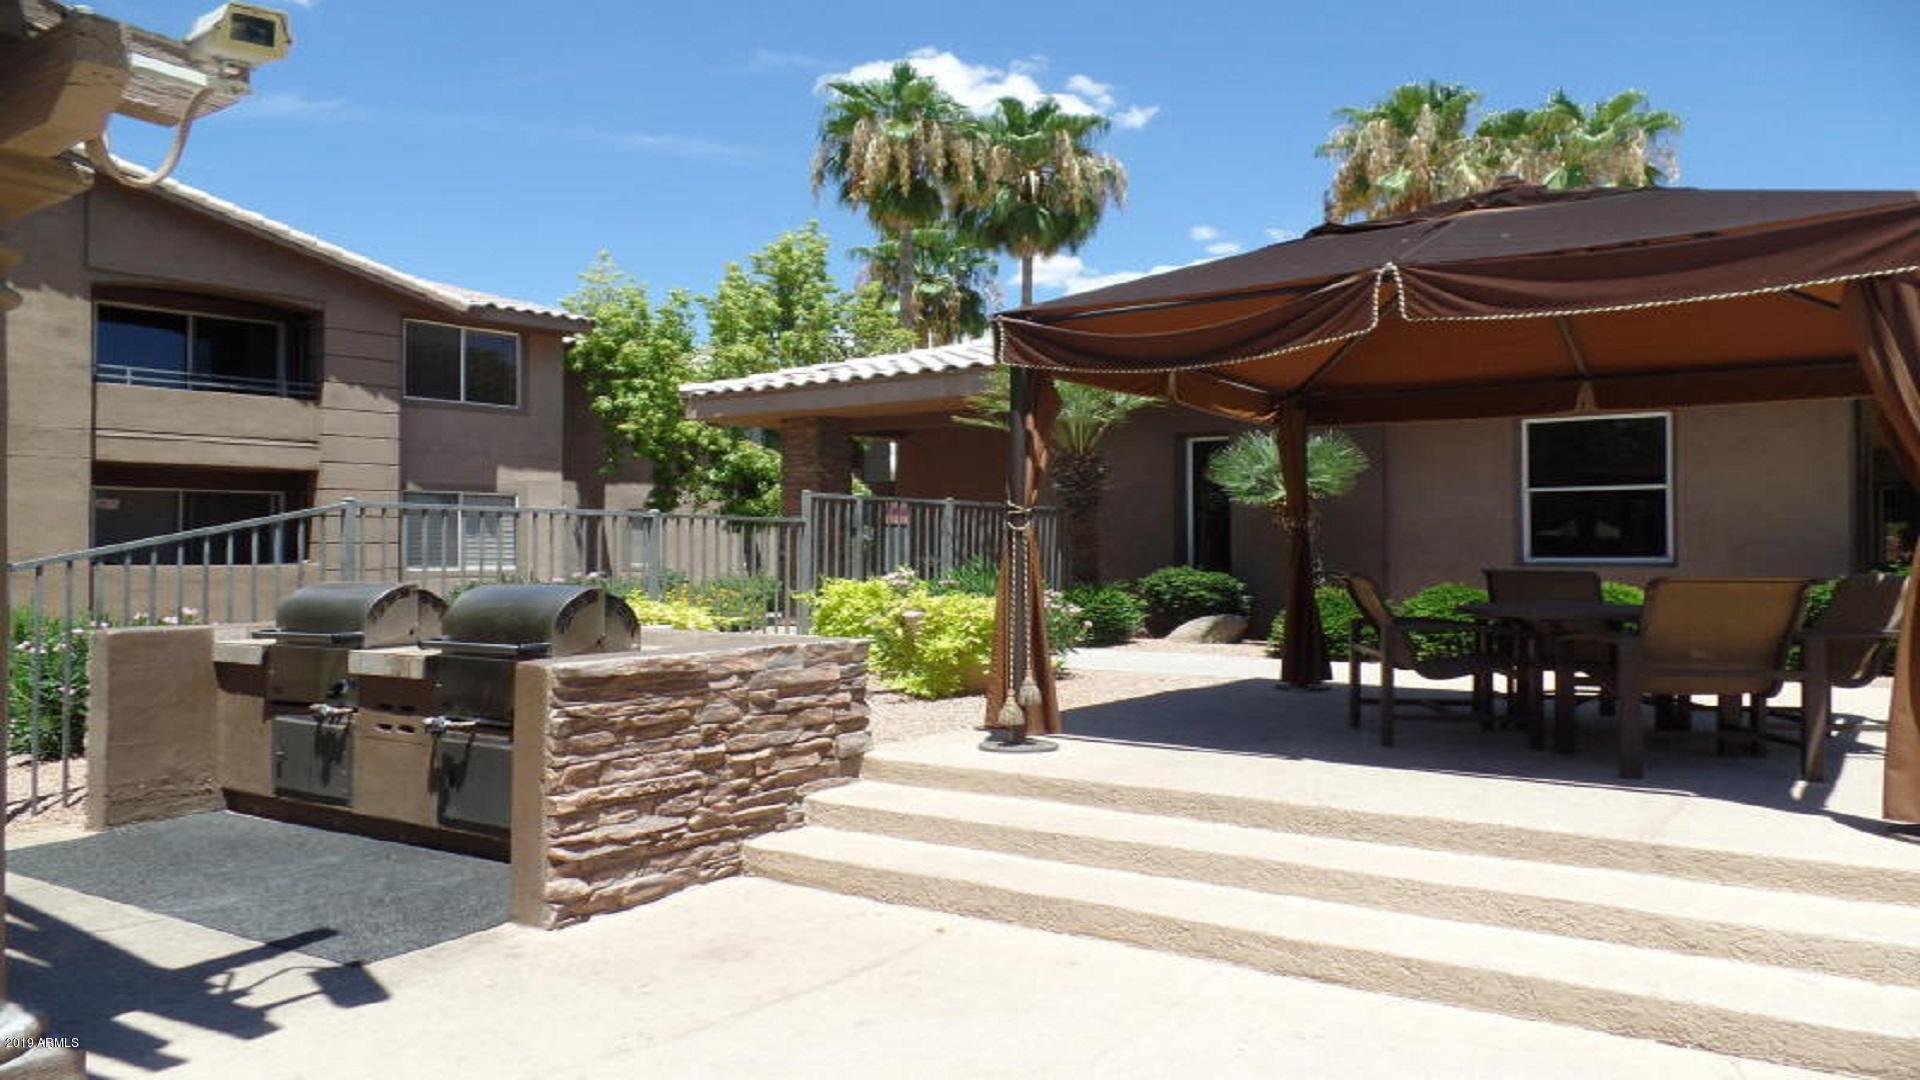 MLS 5944552 7009 E ACOMA Drive Unit 2128, Scottsdale, AZ 85254 Scottsdale AZ Scottsdale Airpark Area